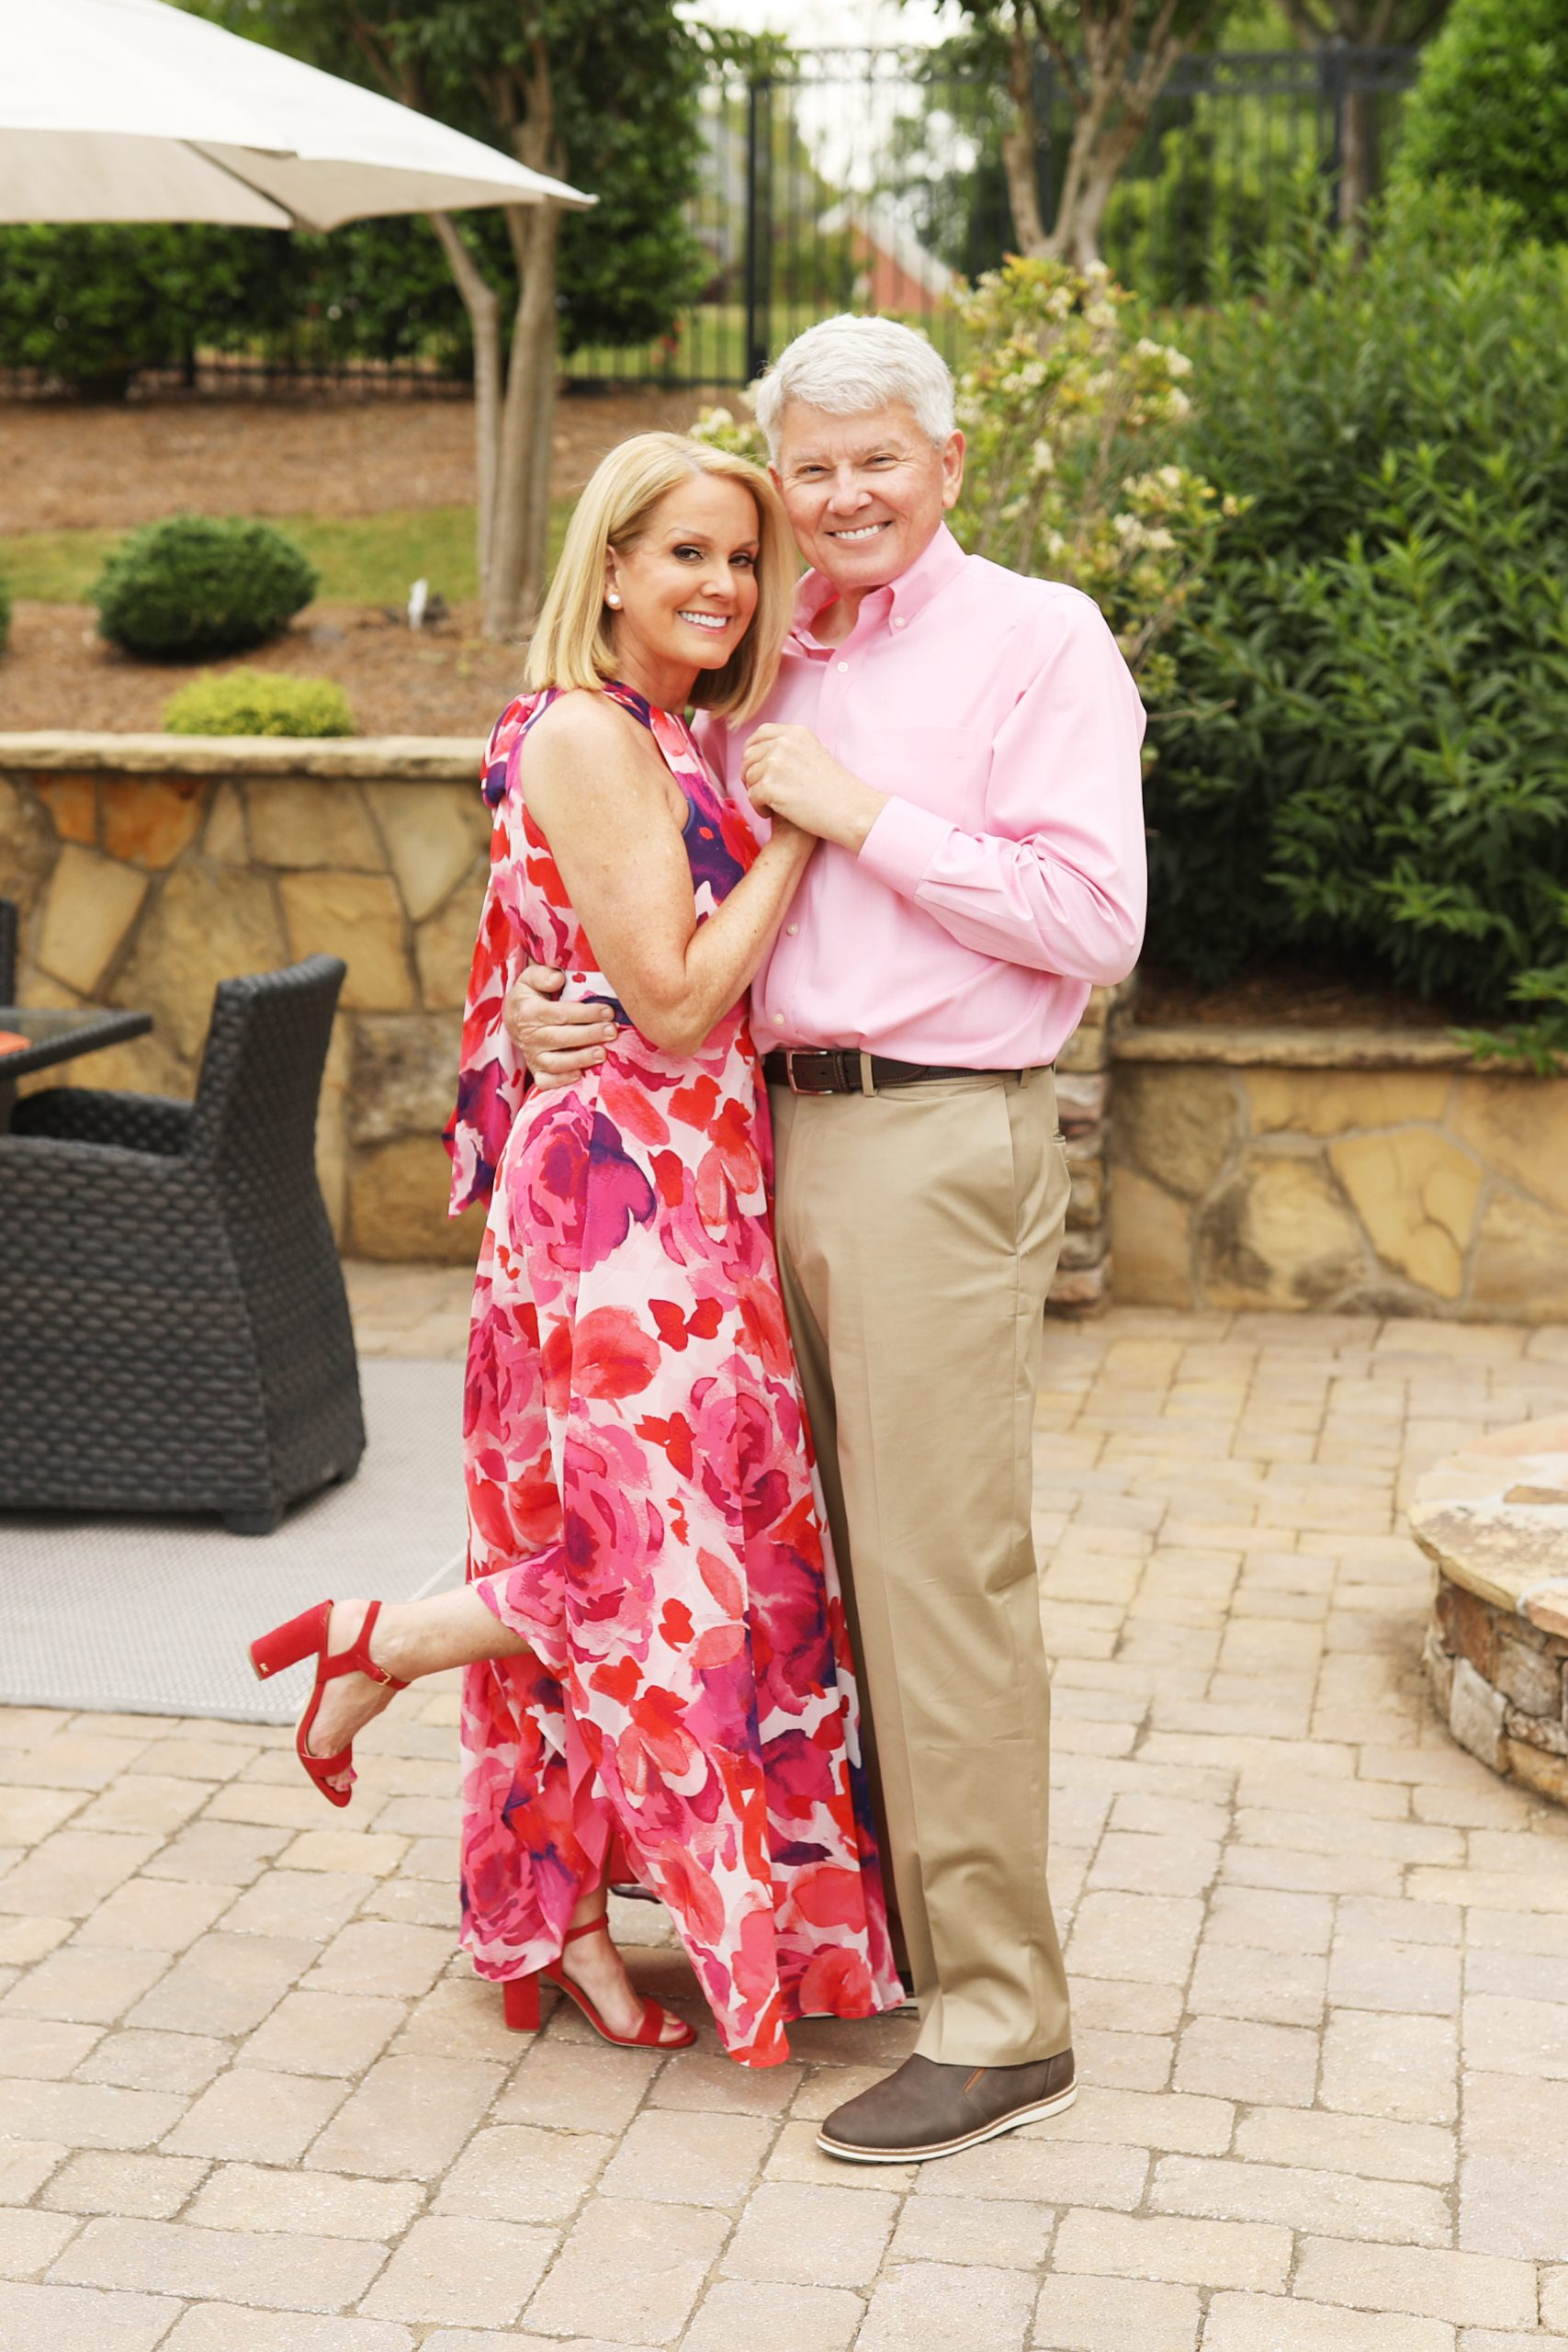 Lori and Eddie Allen celebrate Valentine's Day at home in Atlanta, GA